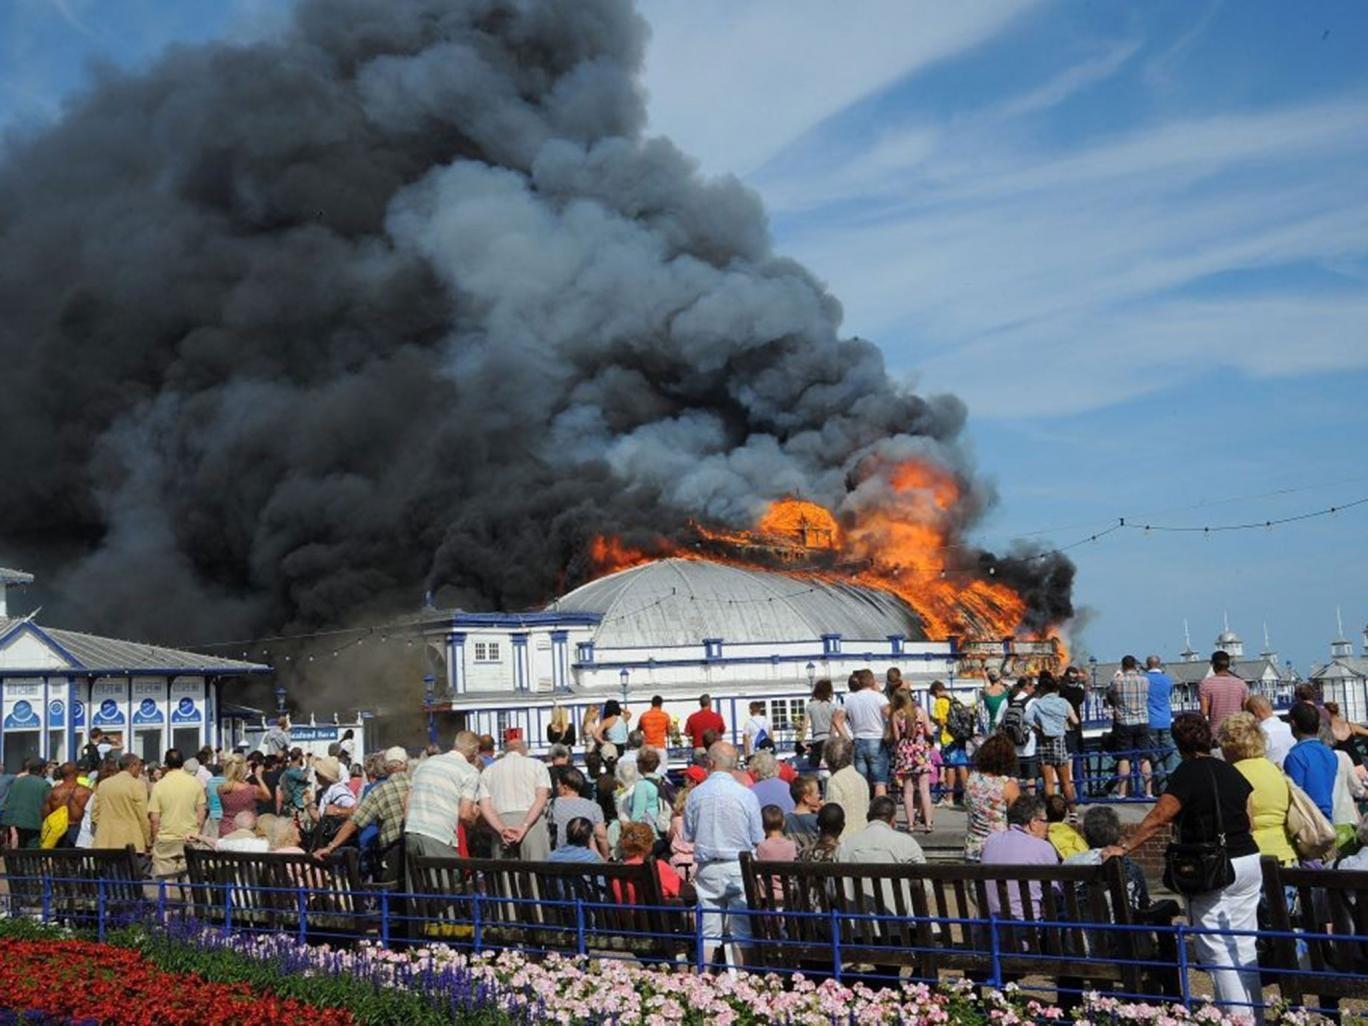 Eastbourne pier ablaze earlier this week